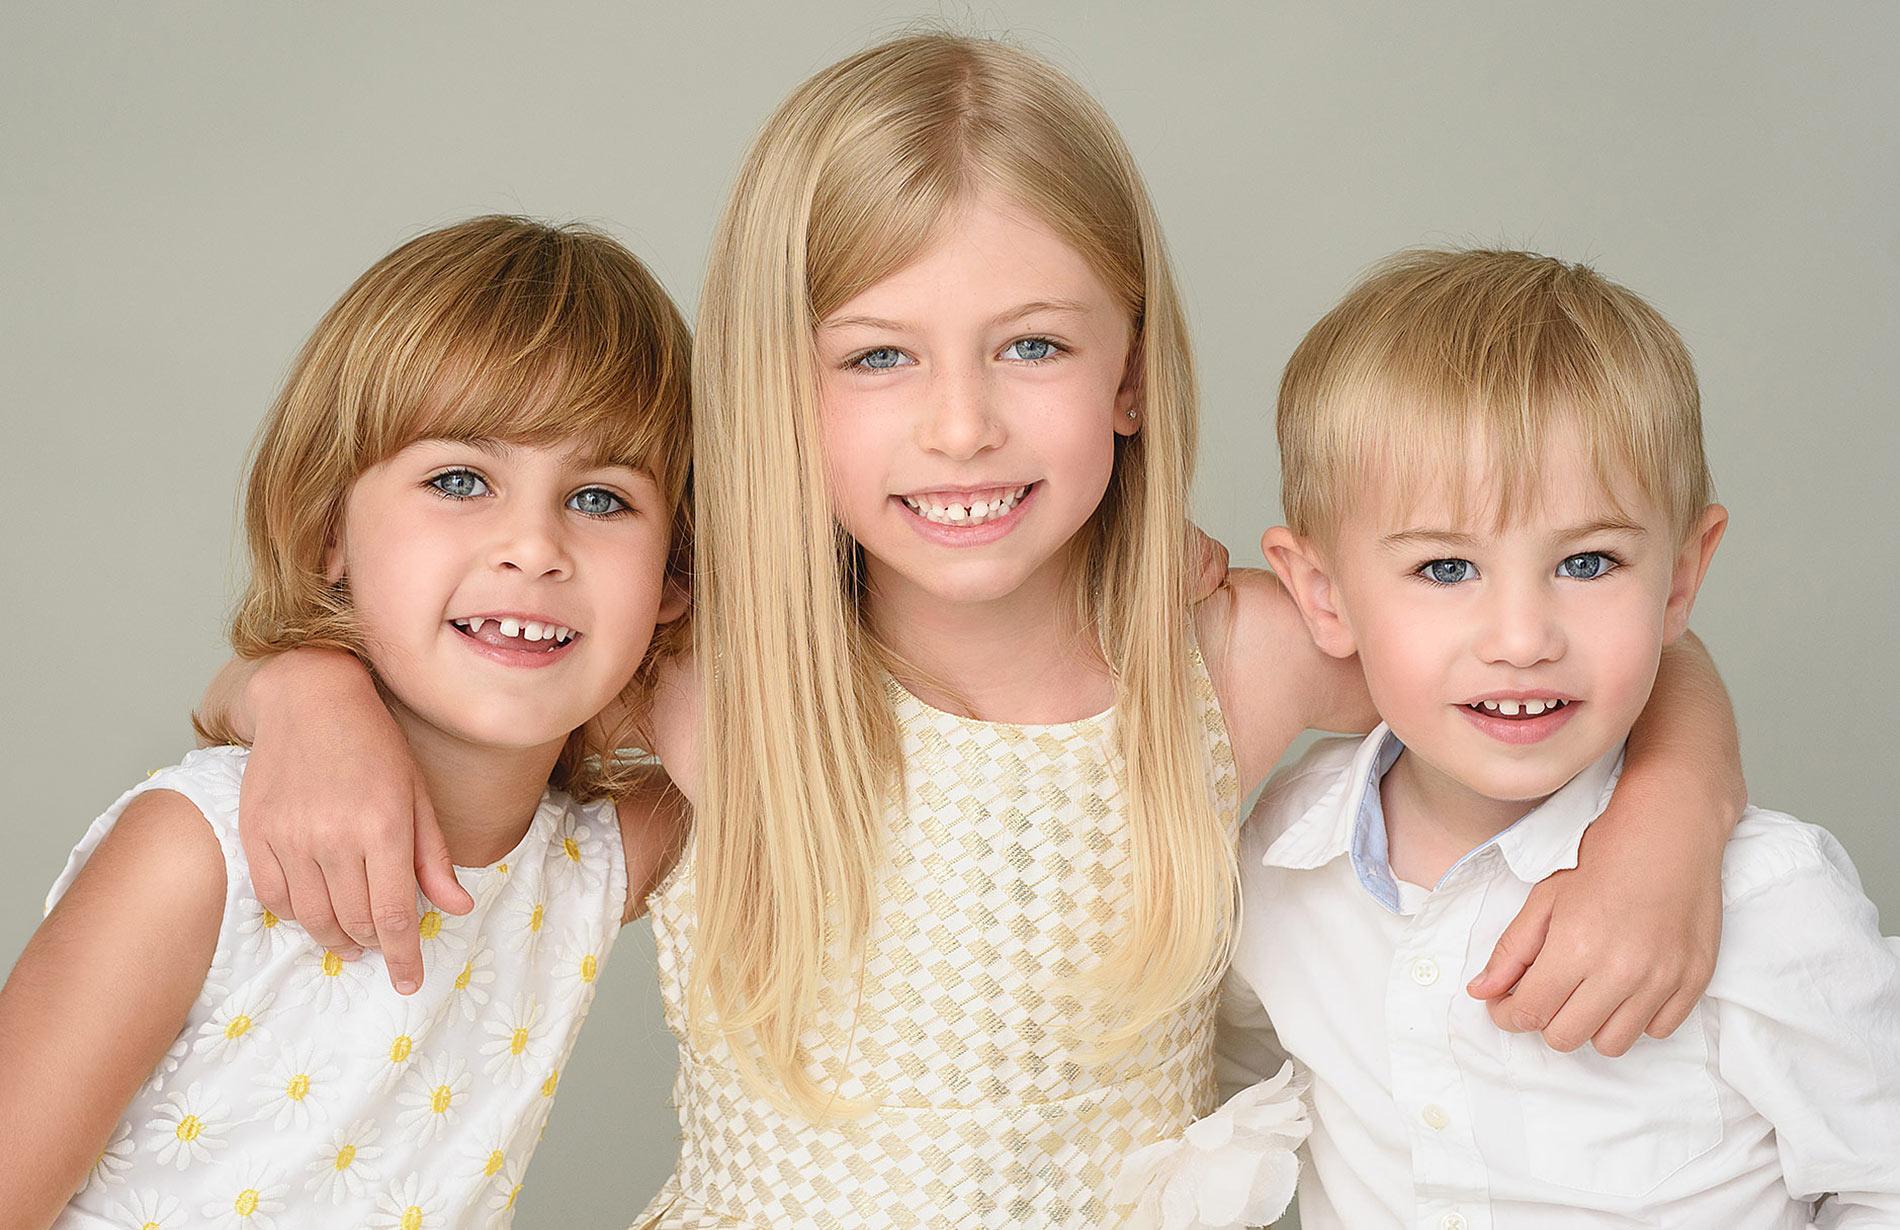 riverside-ct-photography-studio-family-children-portraits.jpg